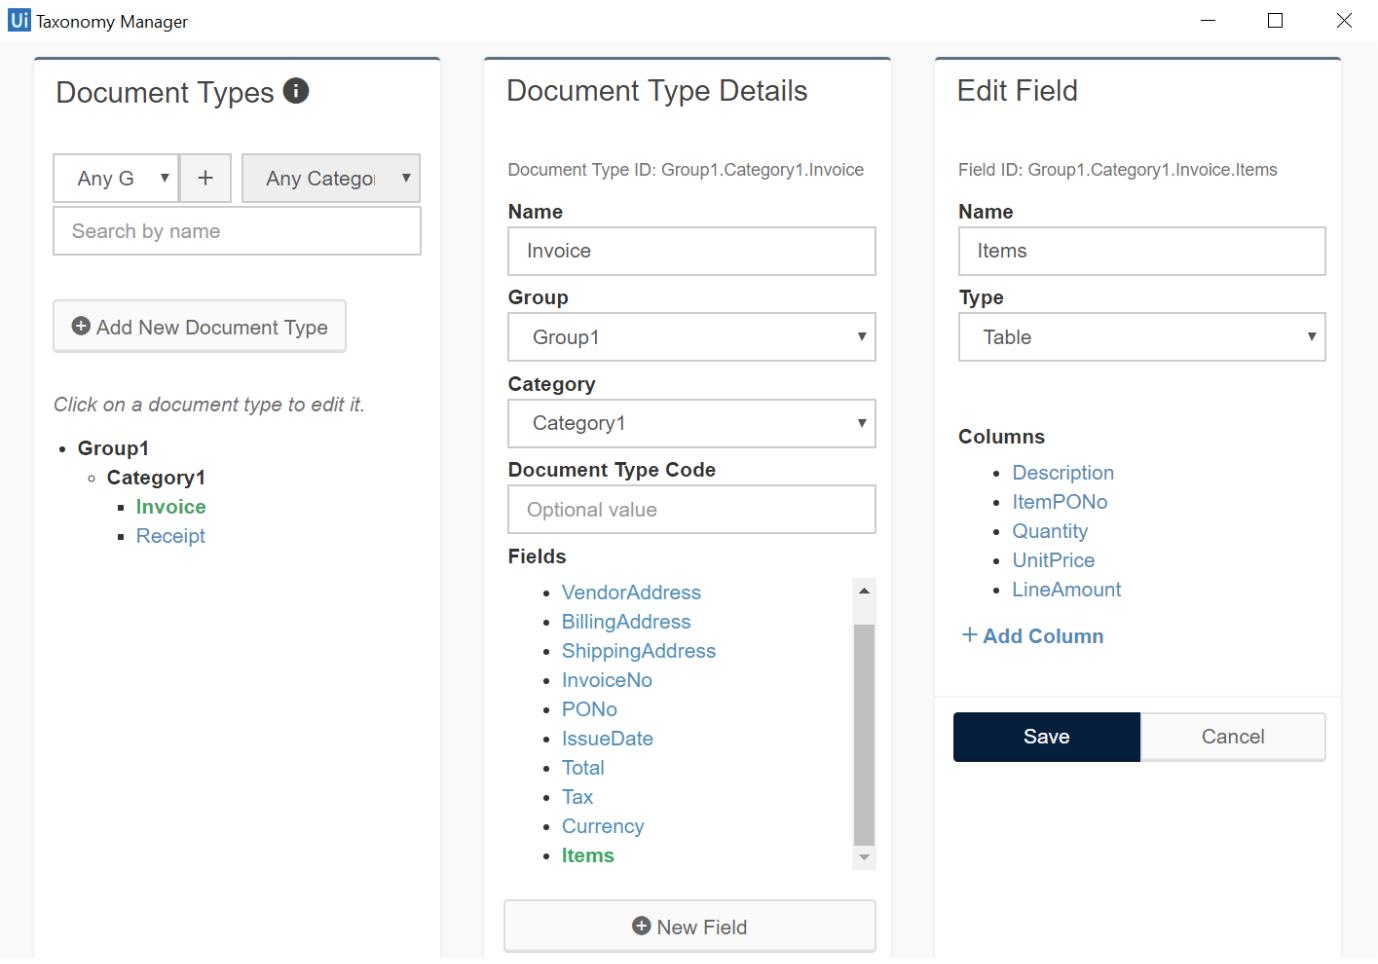 New Player in Data Capture: UiPath Invoice AI